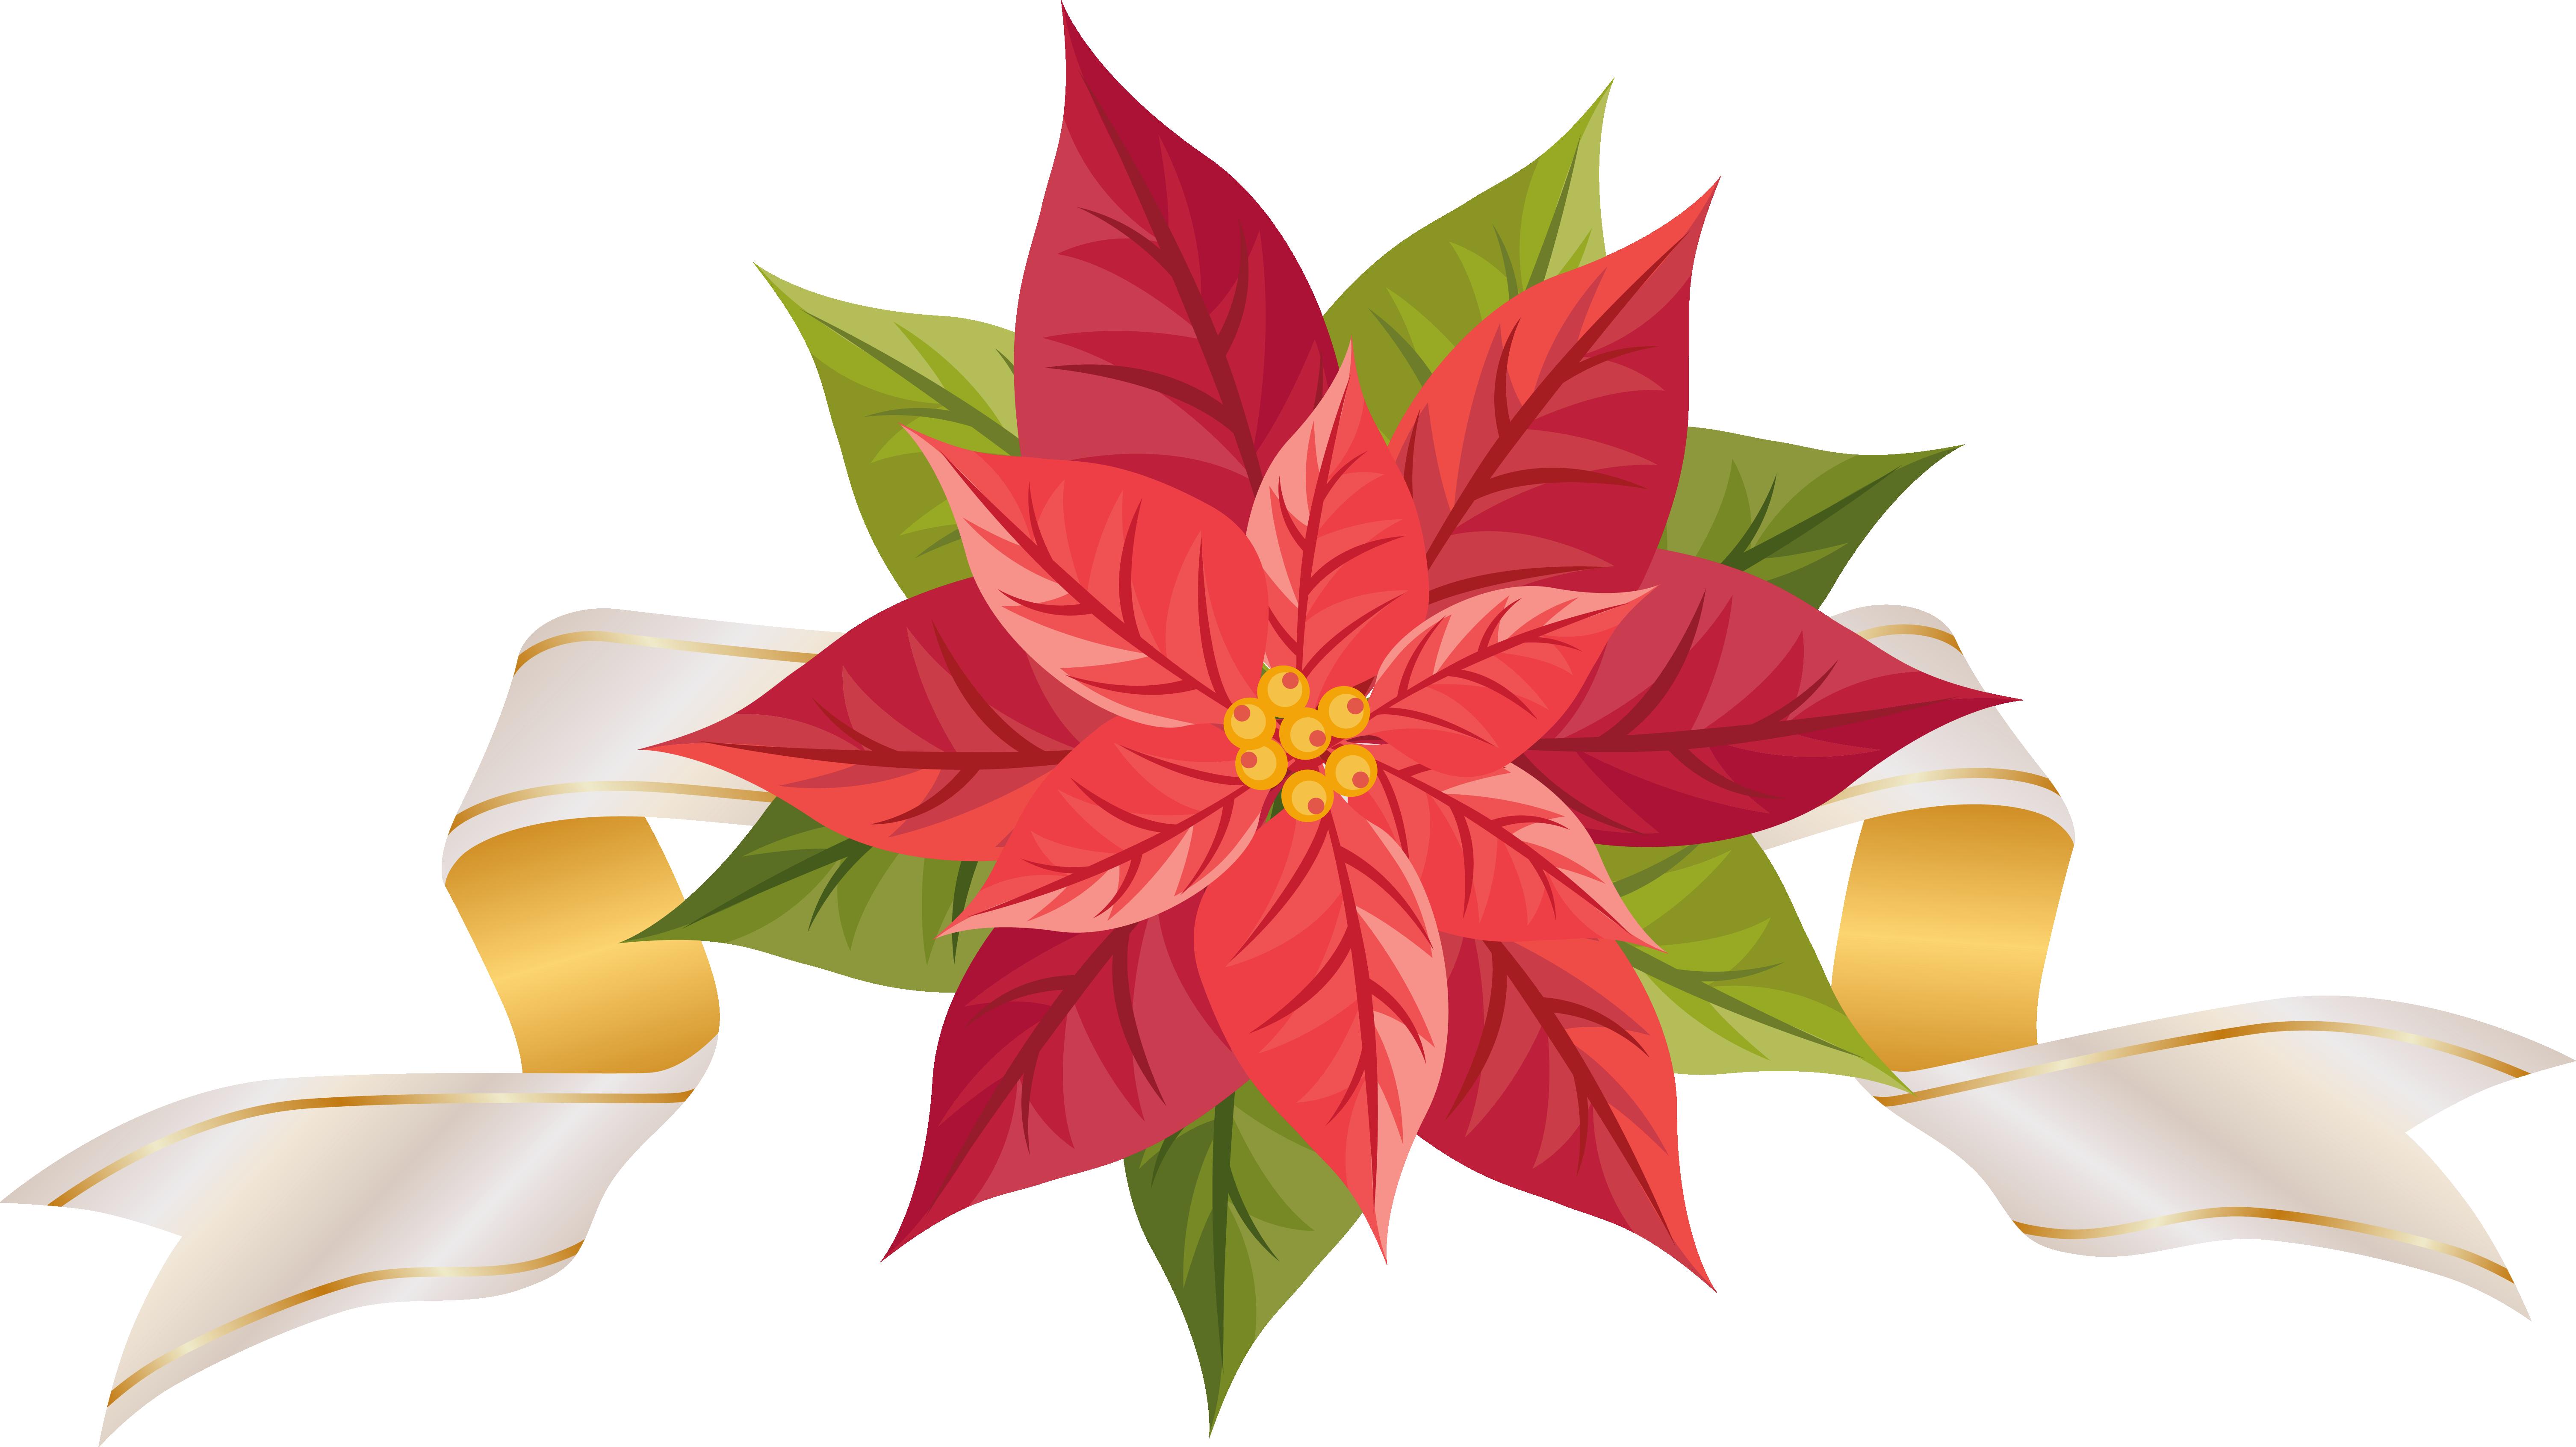 Free Poinsettias Cliparts, Download Free Clip Art, Free Clip.